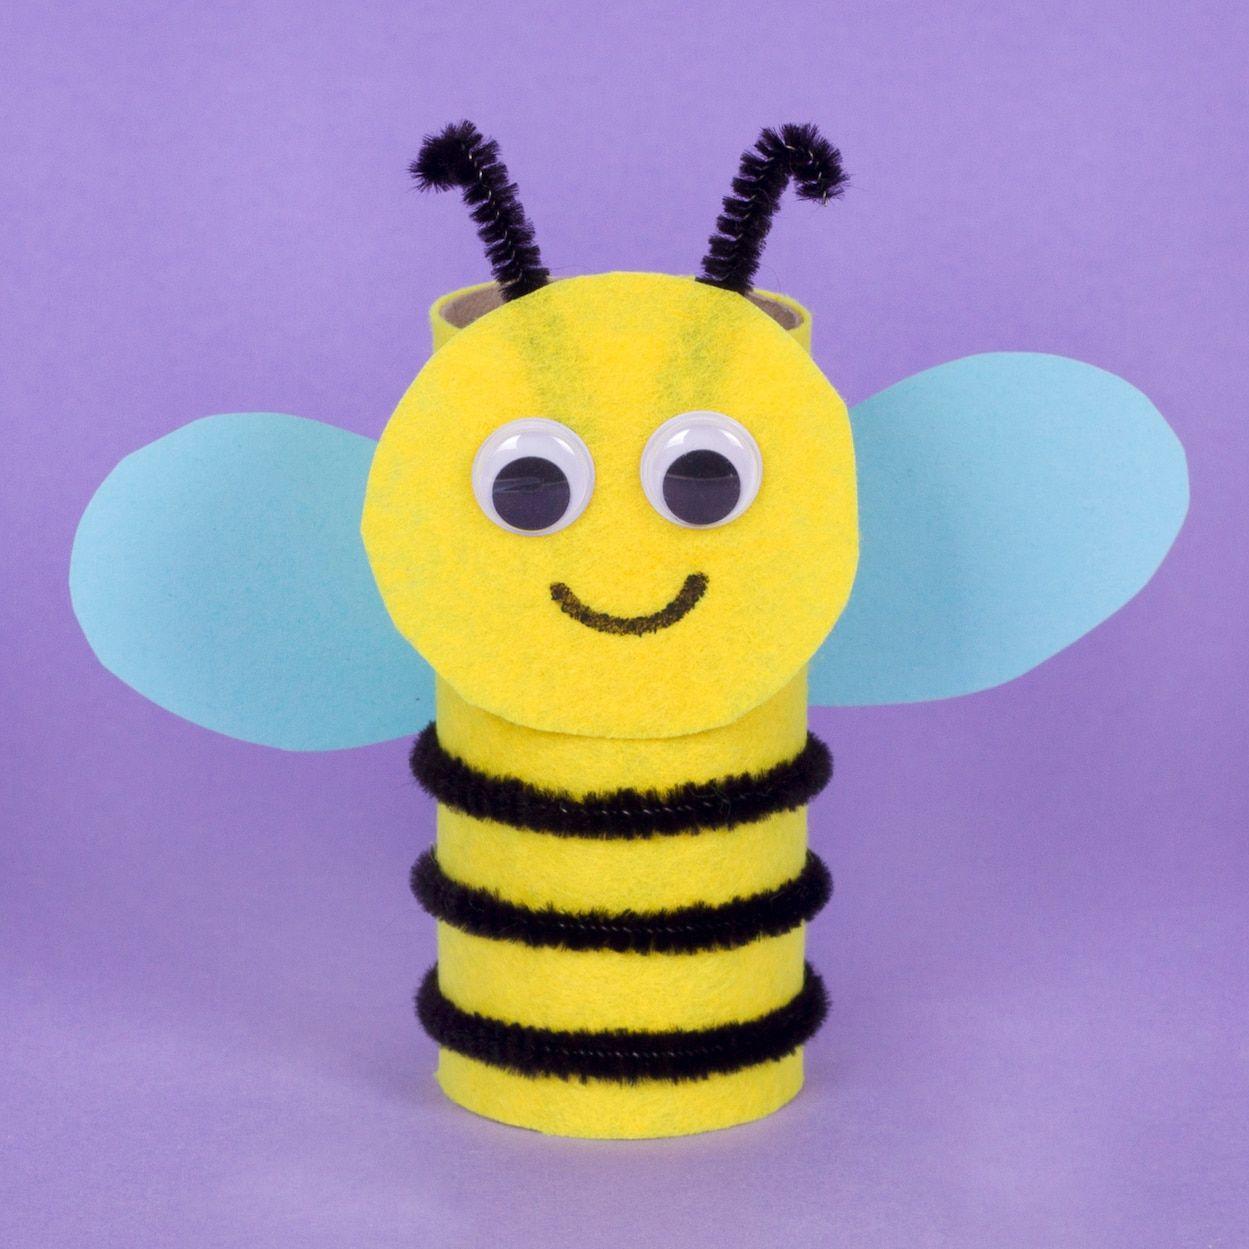 Bumble bee pal art activities for kids cardboard tube